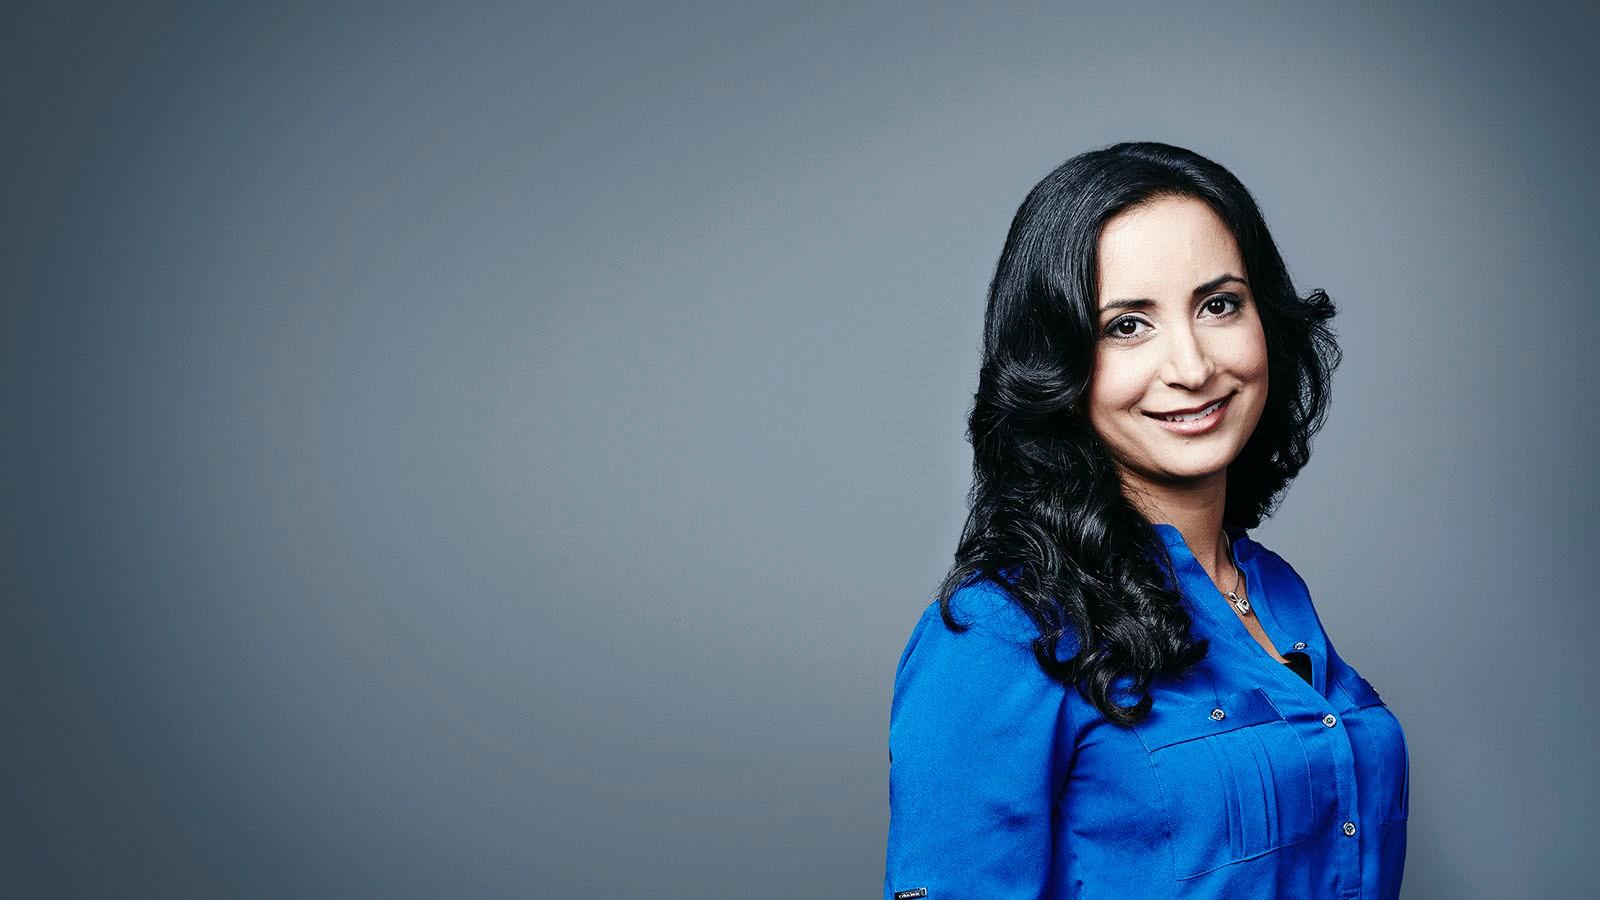 profiles azadeh ansari profile